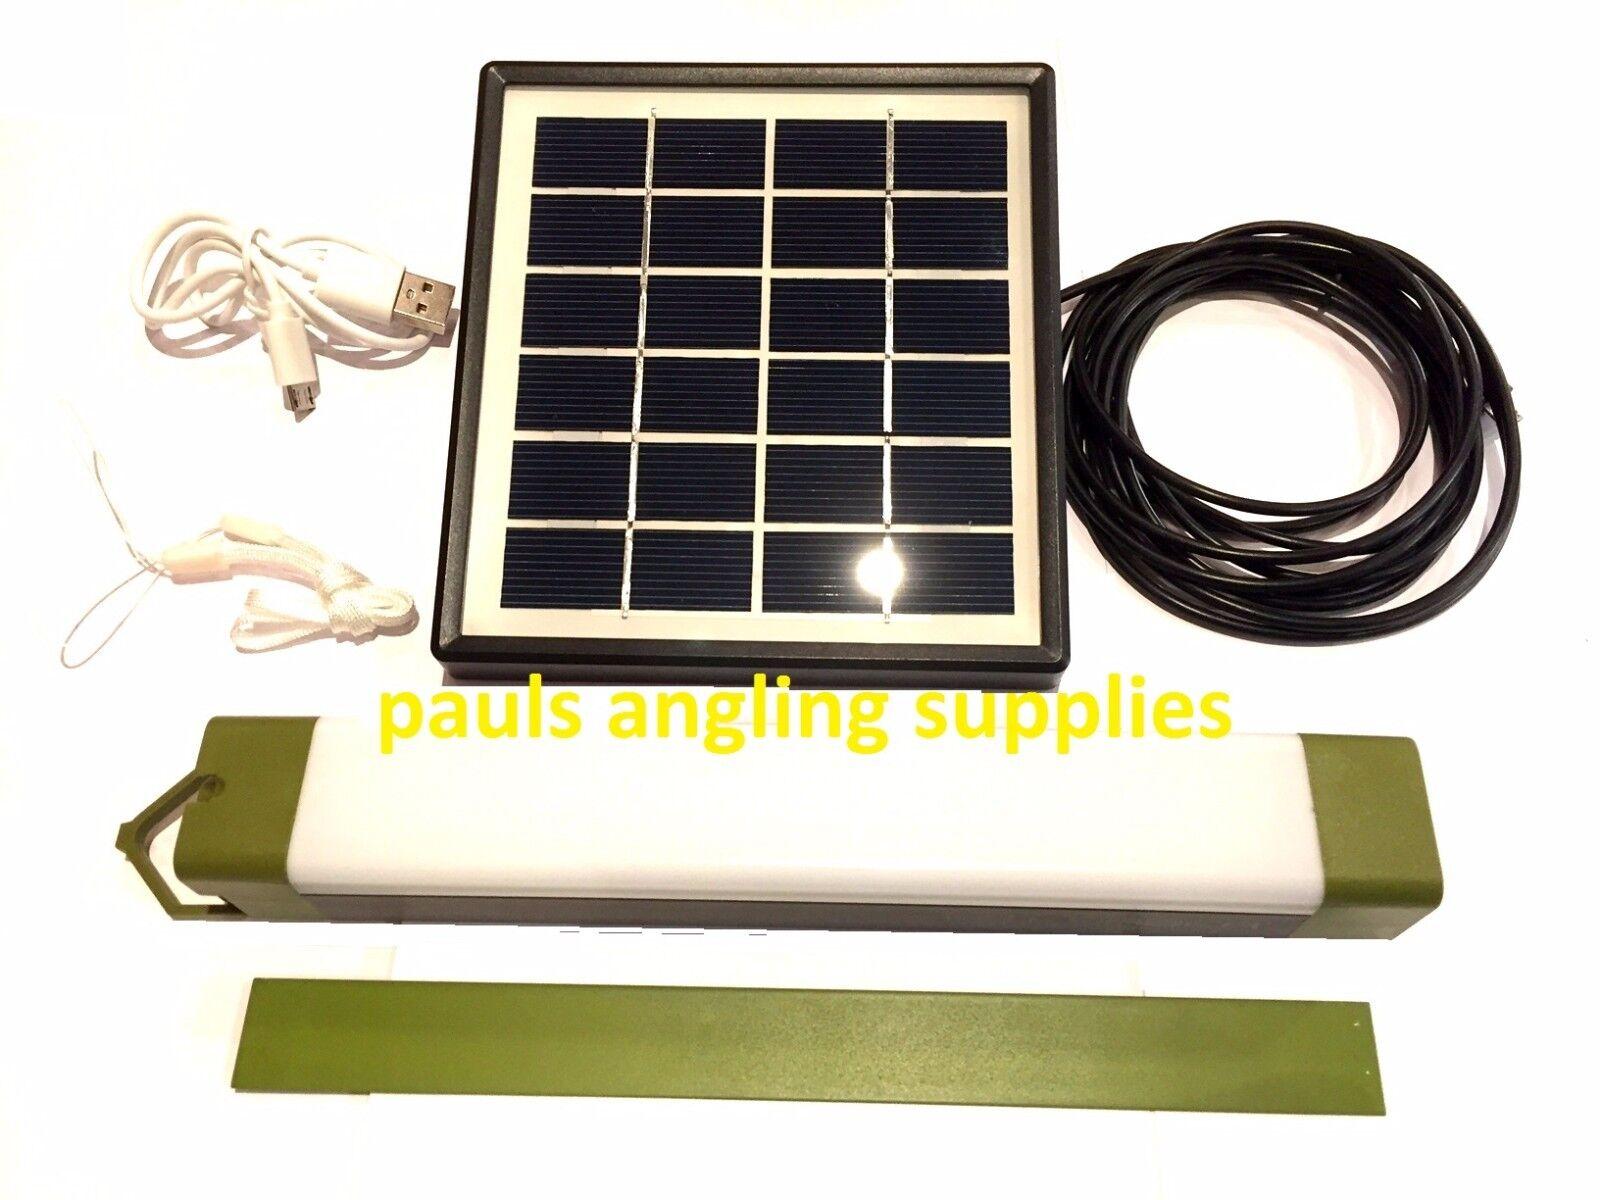 LITESABER  Fishing Bivvy Light Power Bank Charging Function & Solar Panel Option